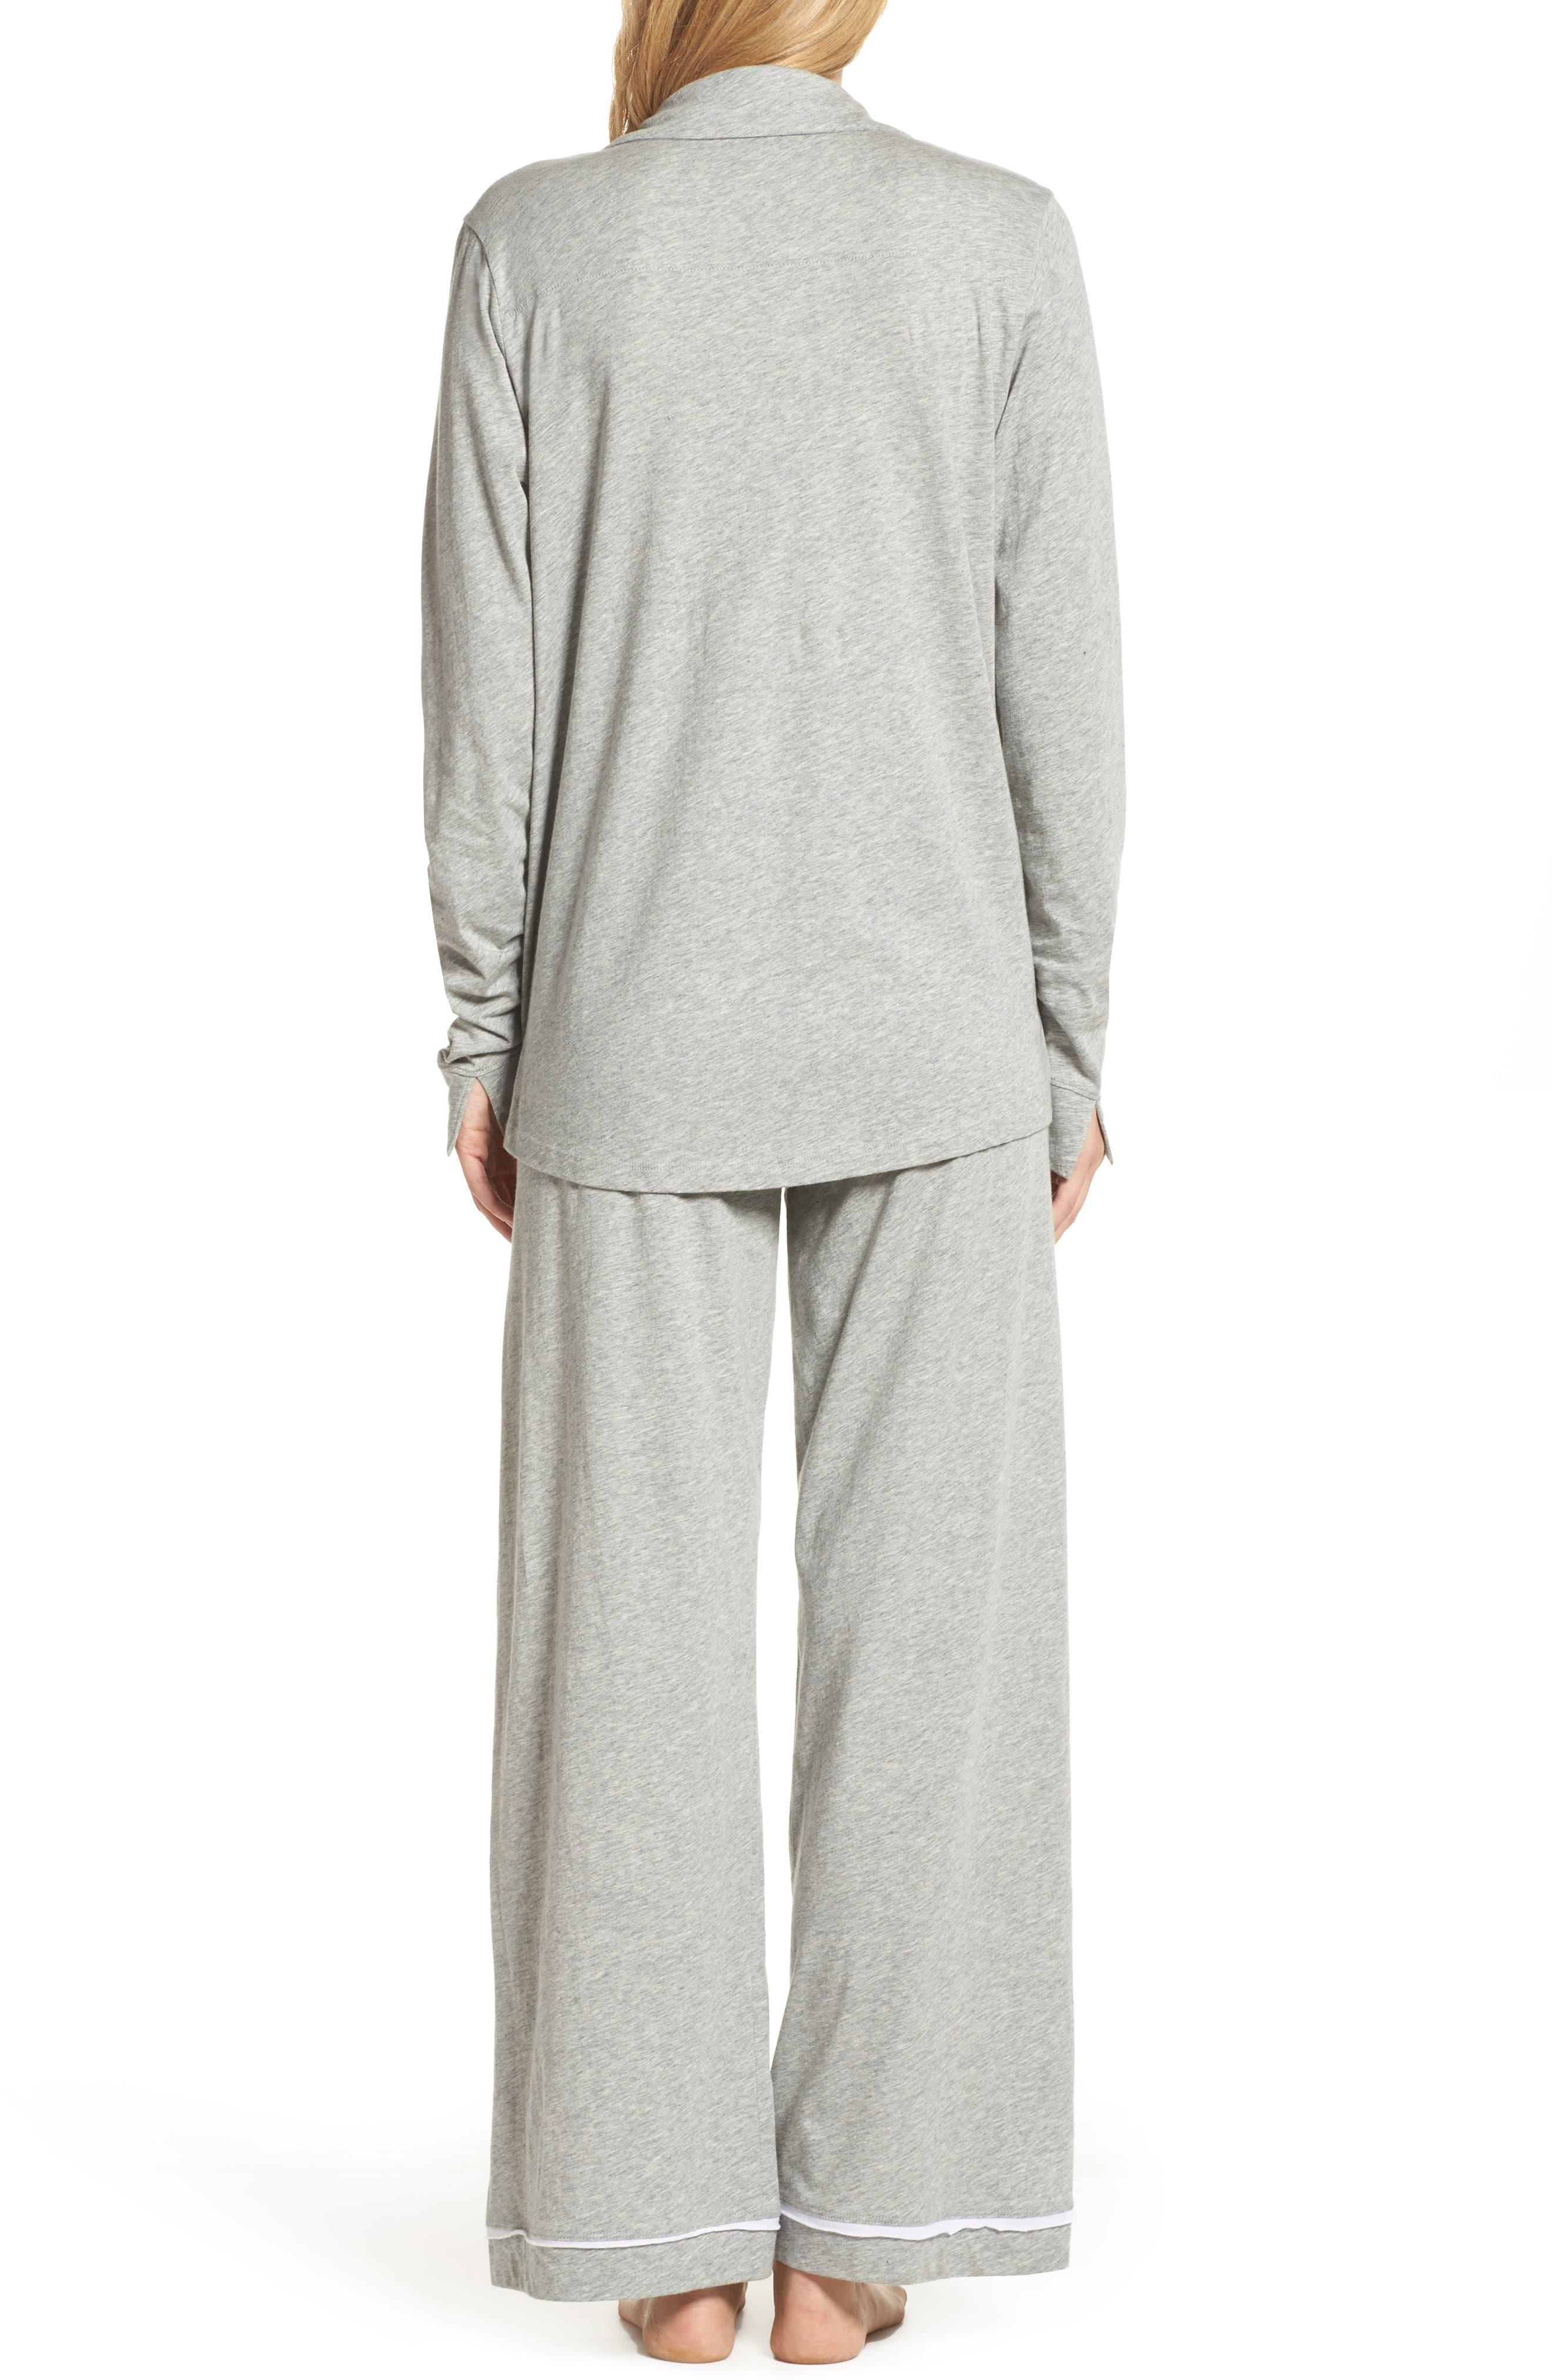 Penelope Pima Cotton Pajamas,                             Alternate thumbnail 2, color,